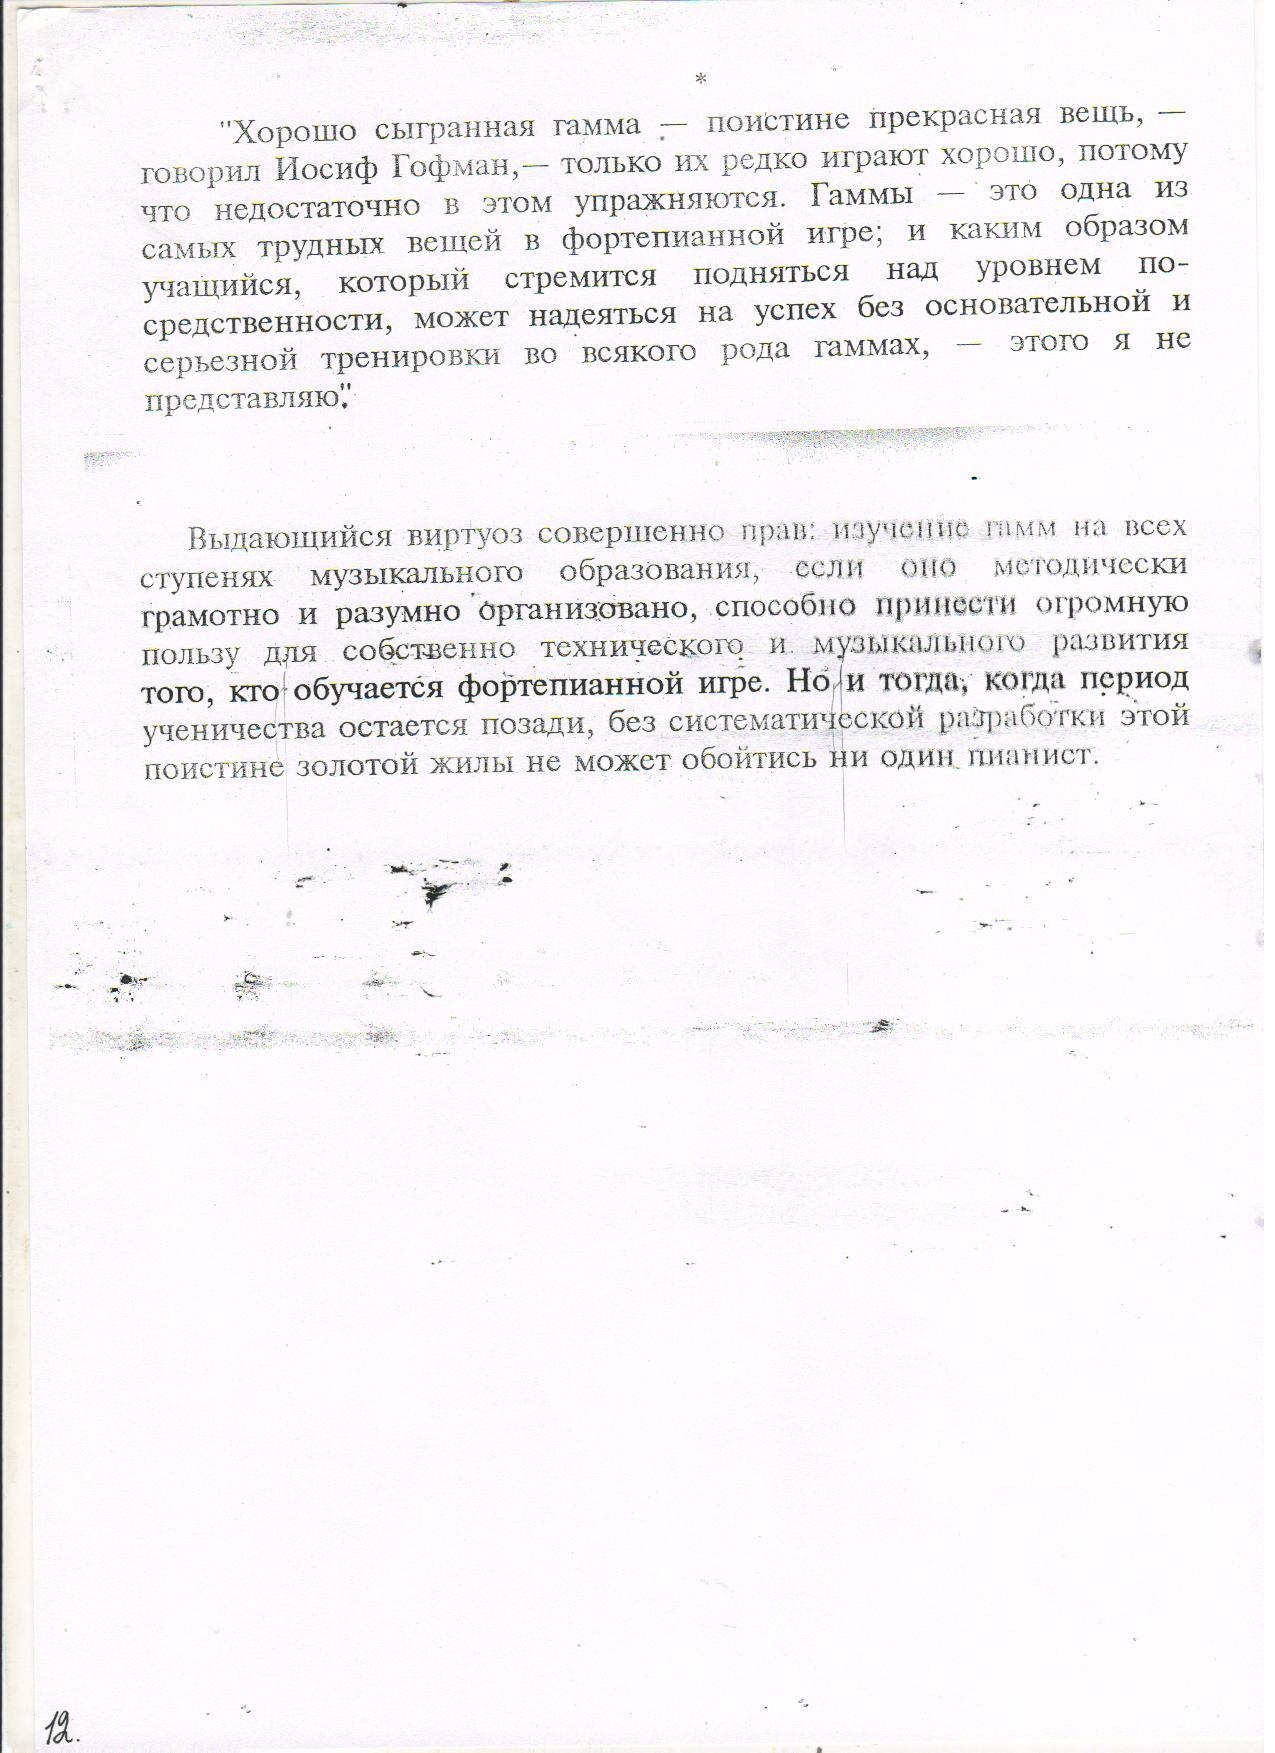 C:\Documents and Settings\Учитель\Рабочий стол\гаммы 14.jpg